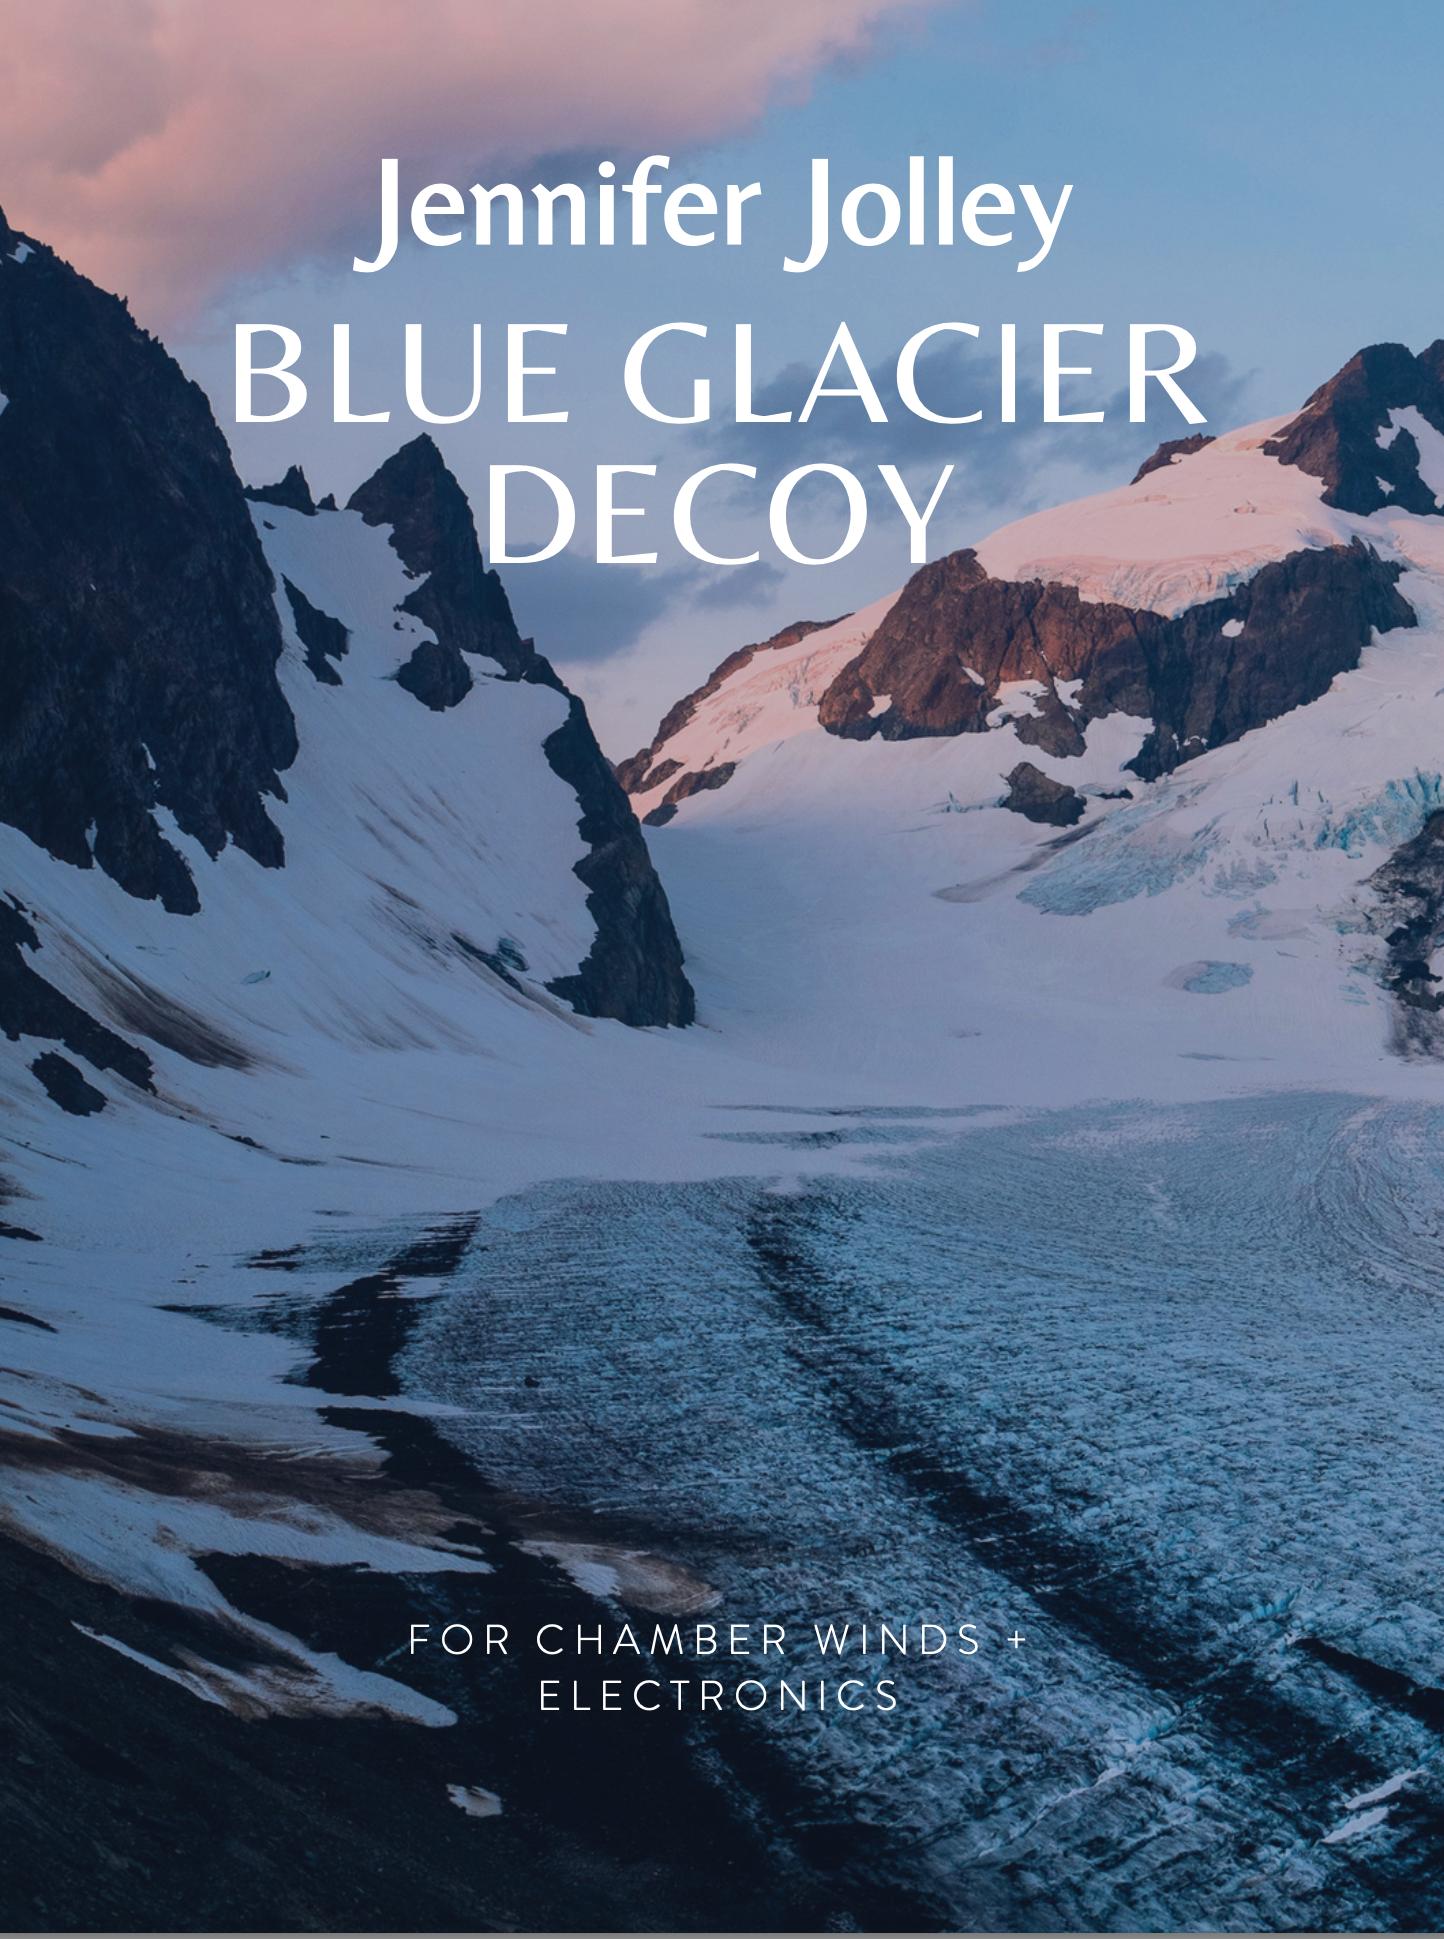 Blue Glacier Decoy by Jennifer Jolley